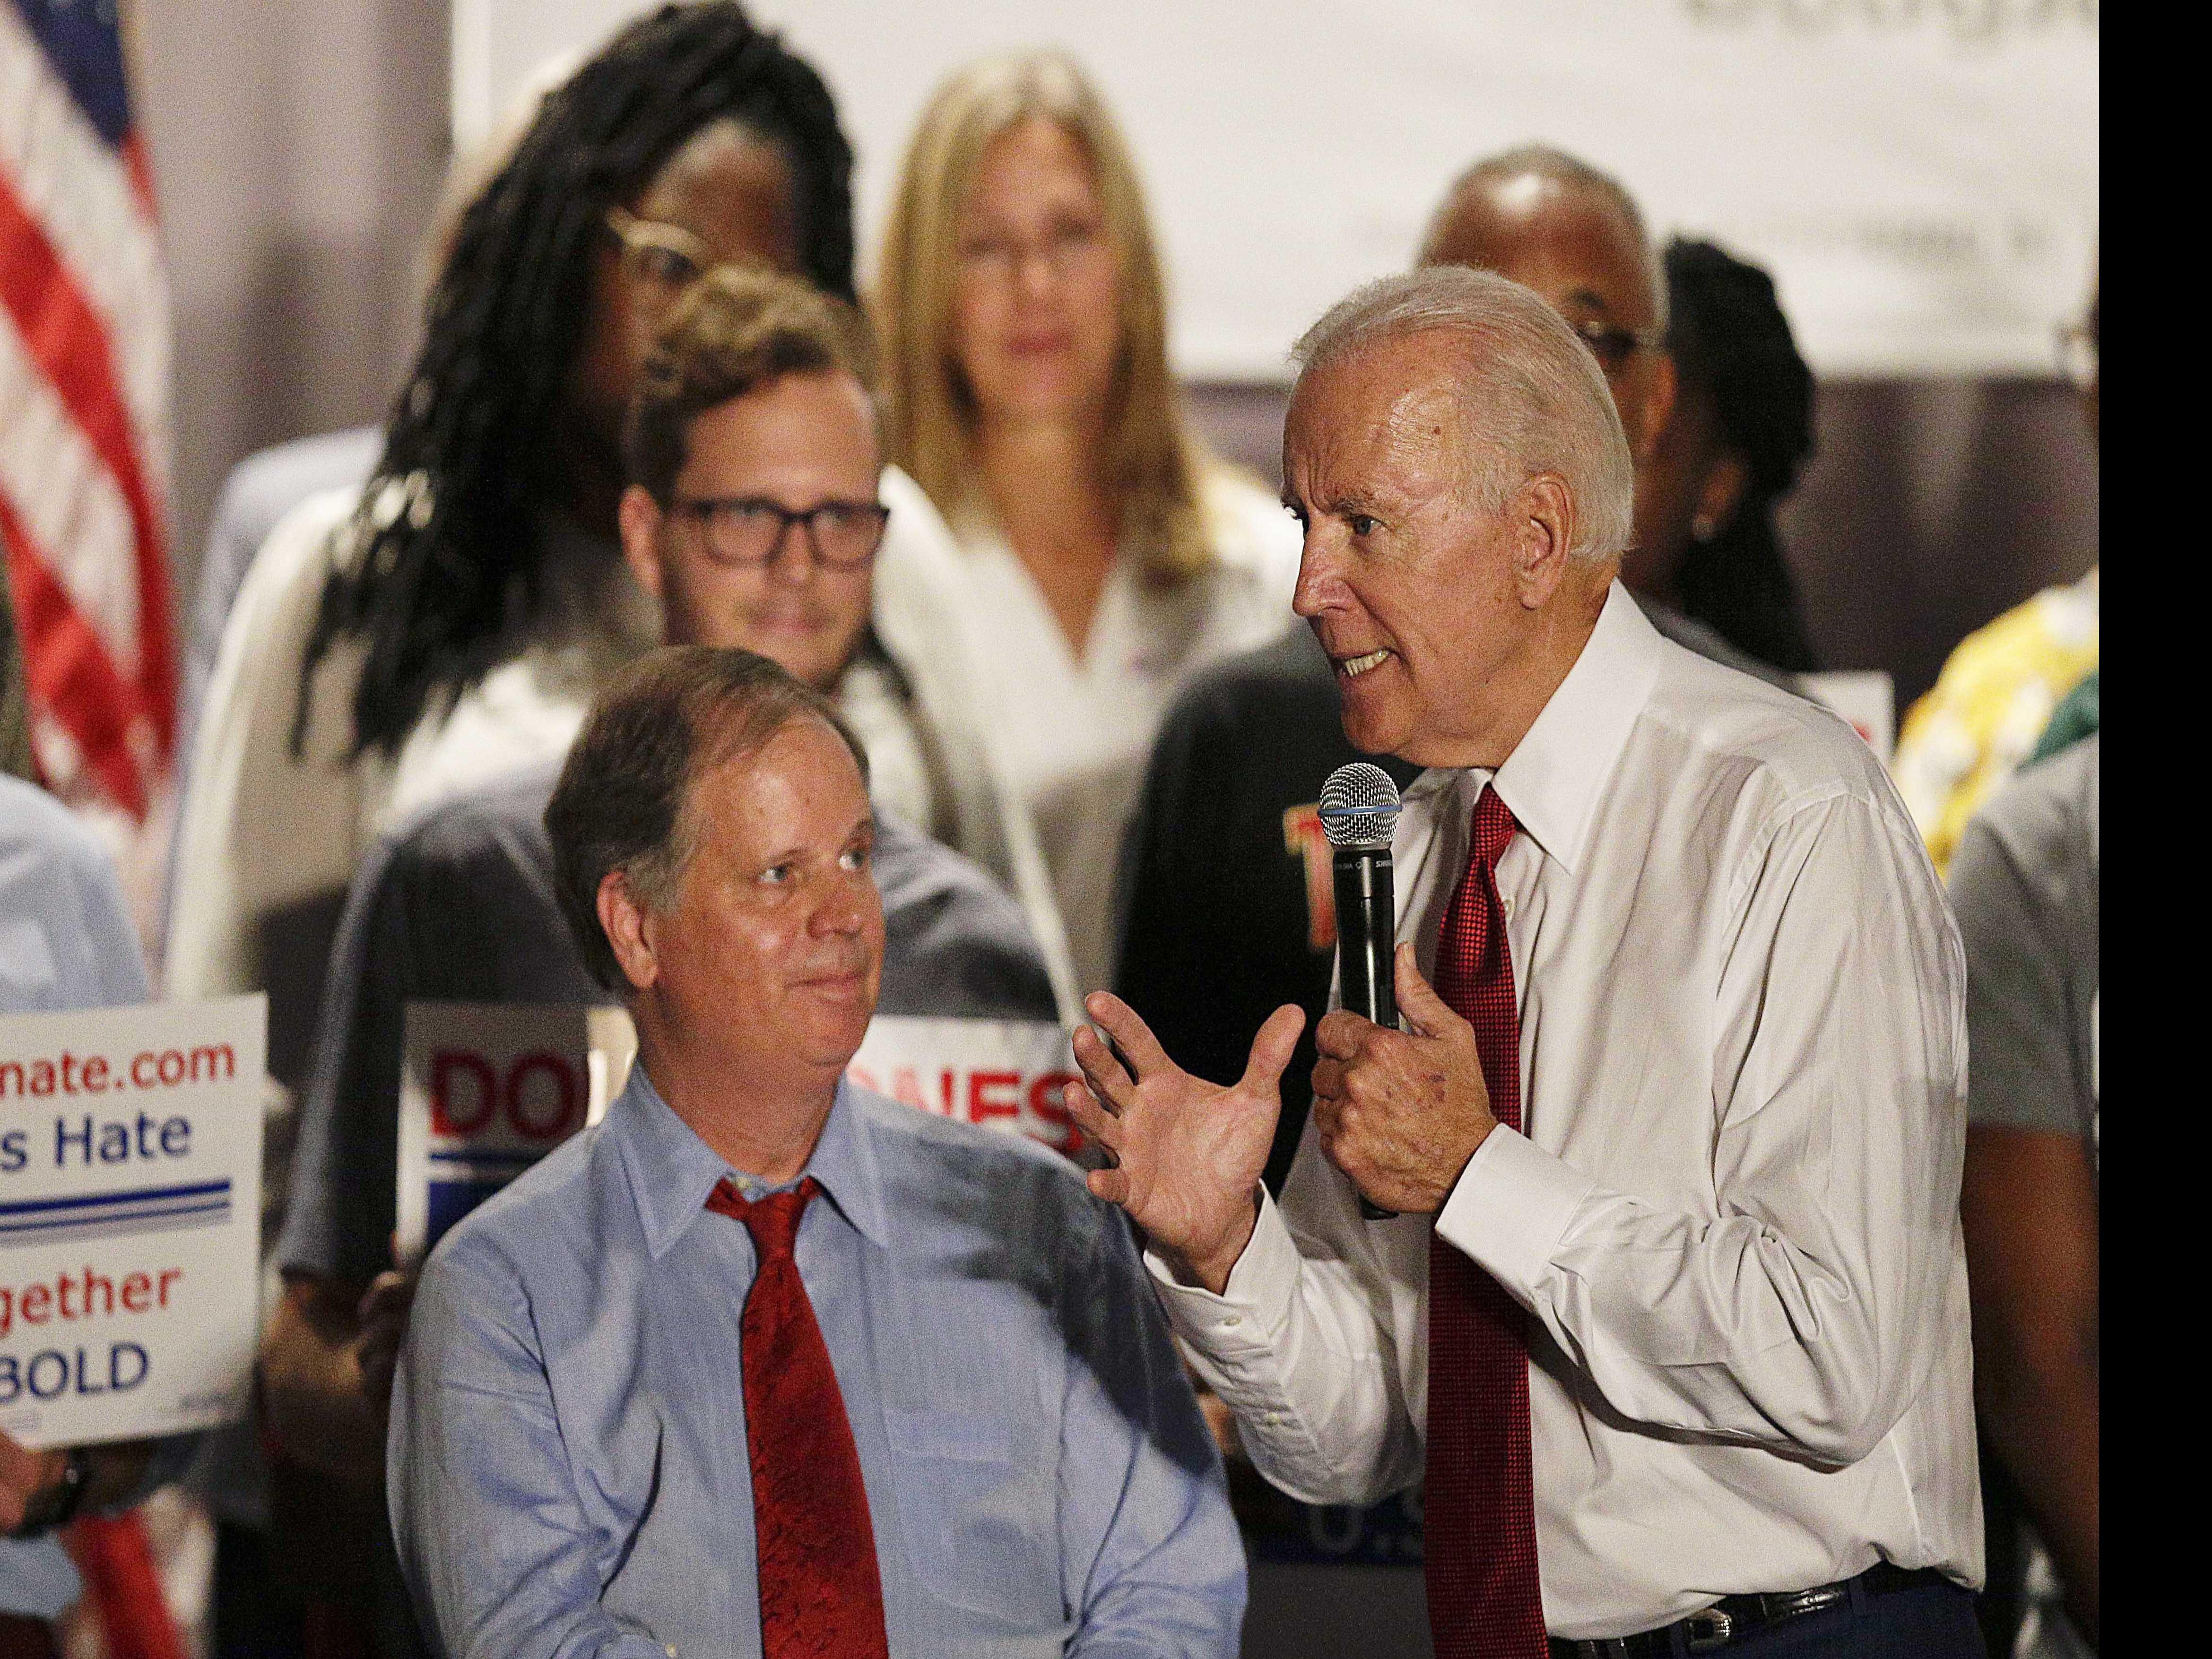 Biden in Alabama to Campaign for Democrat Jones for Senate